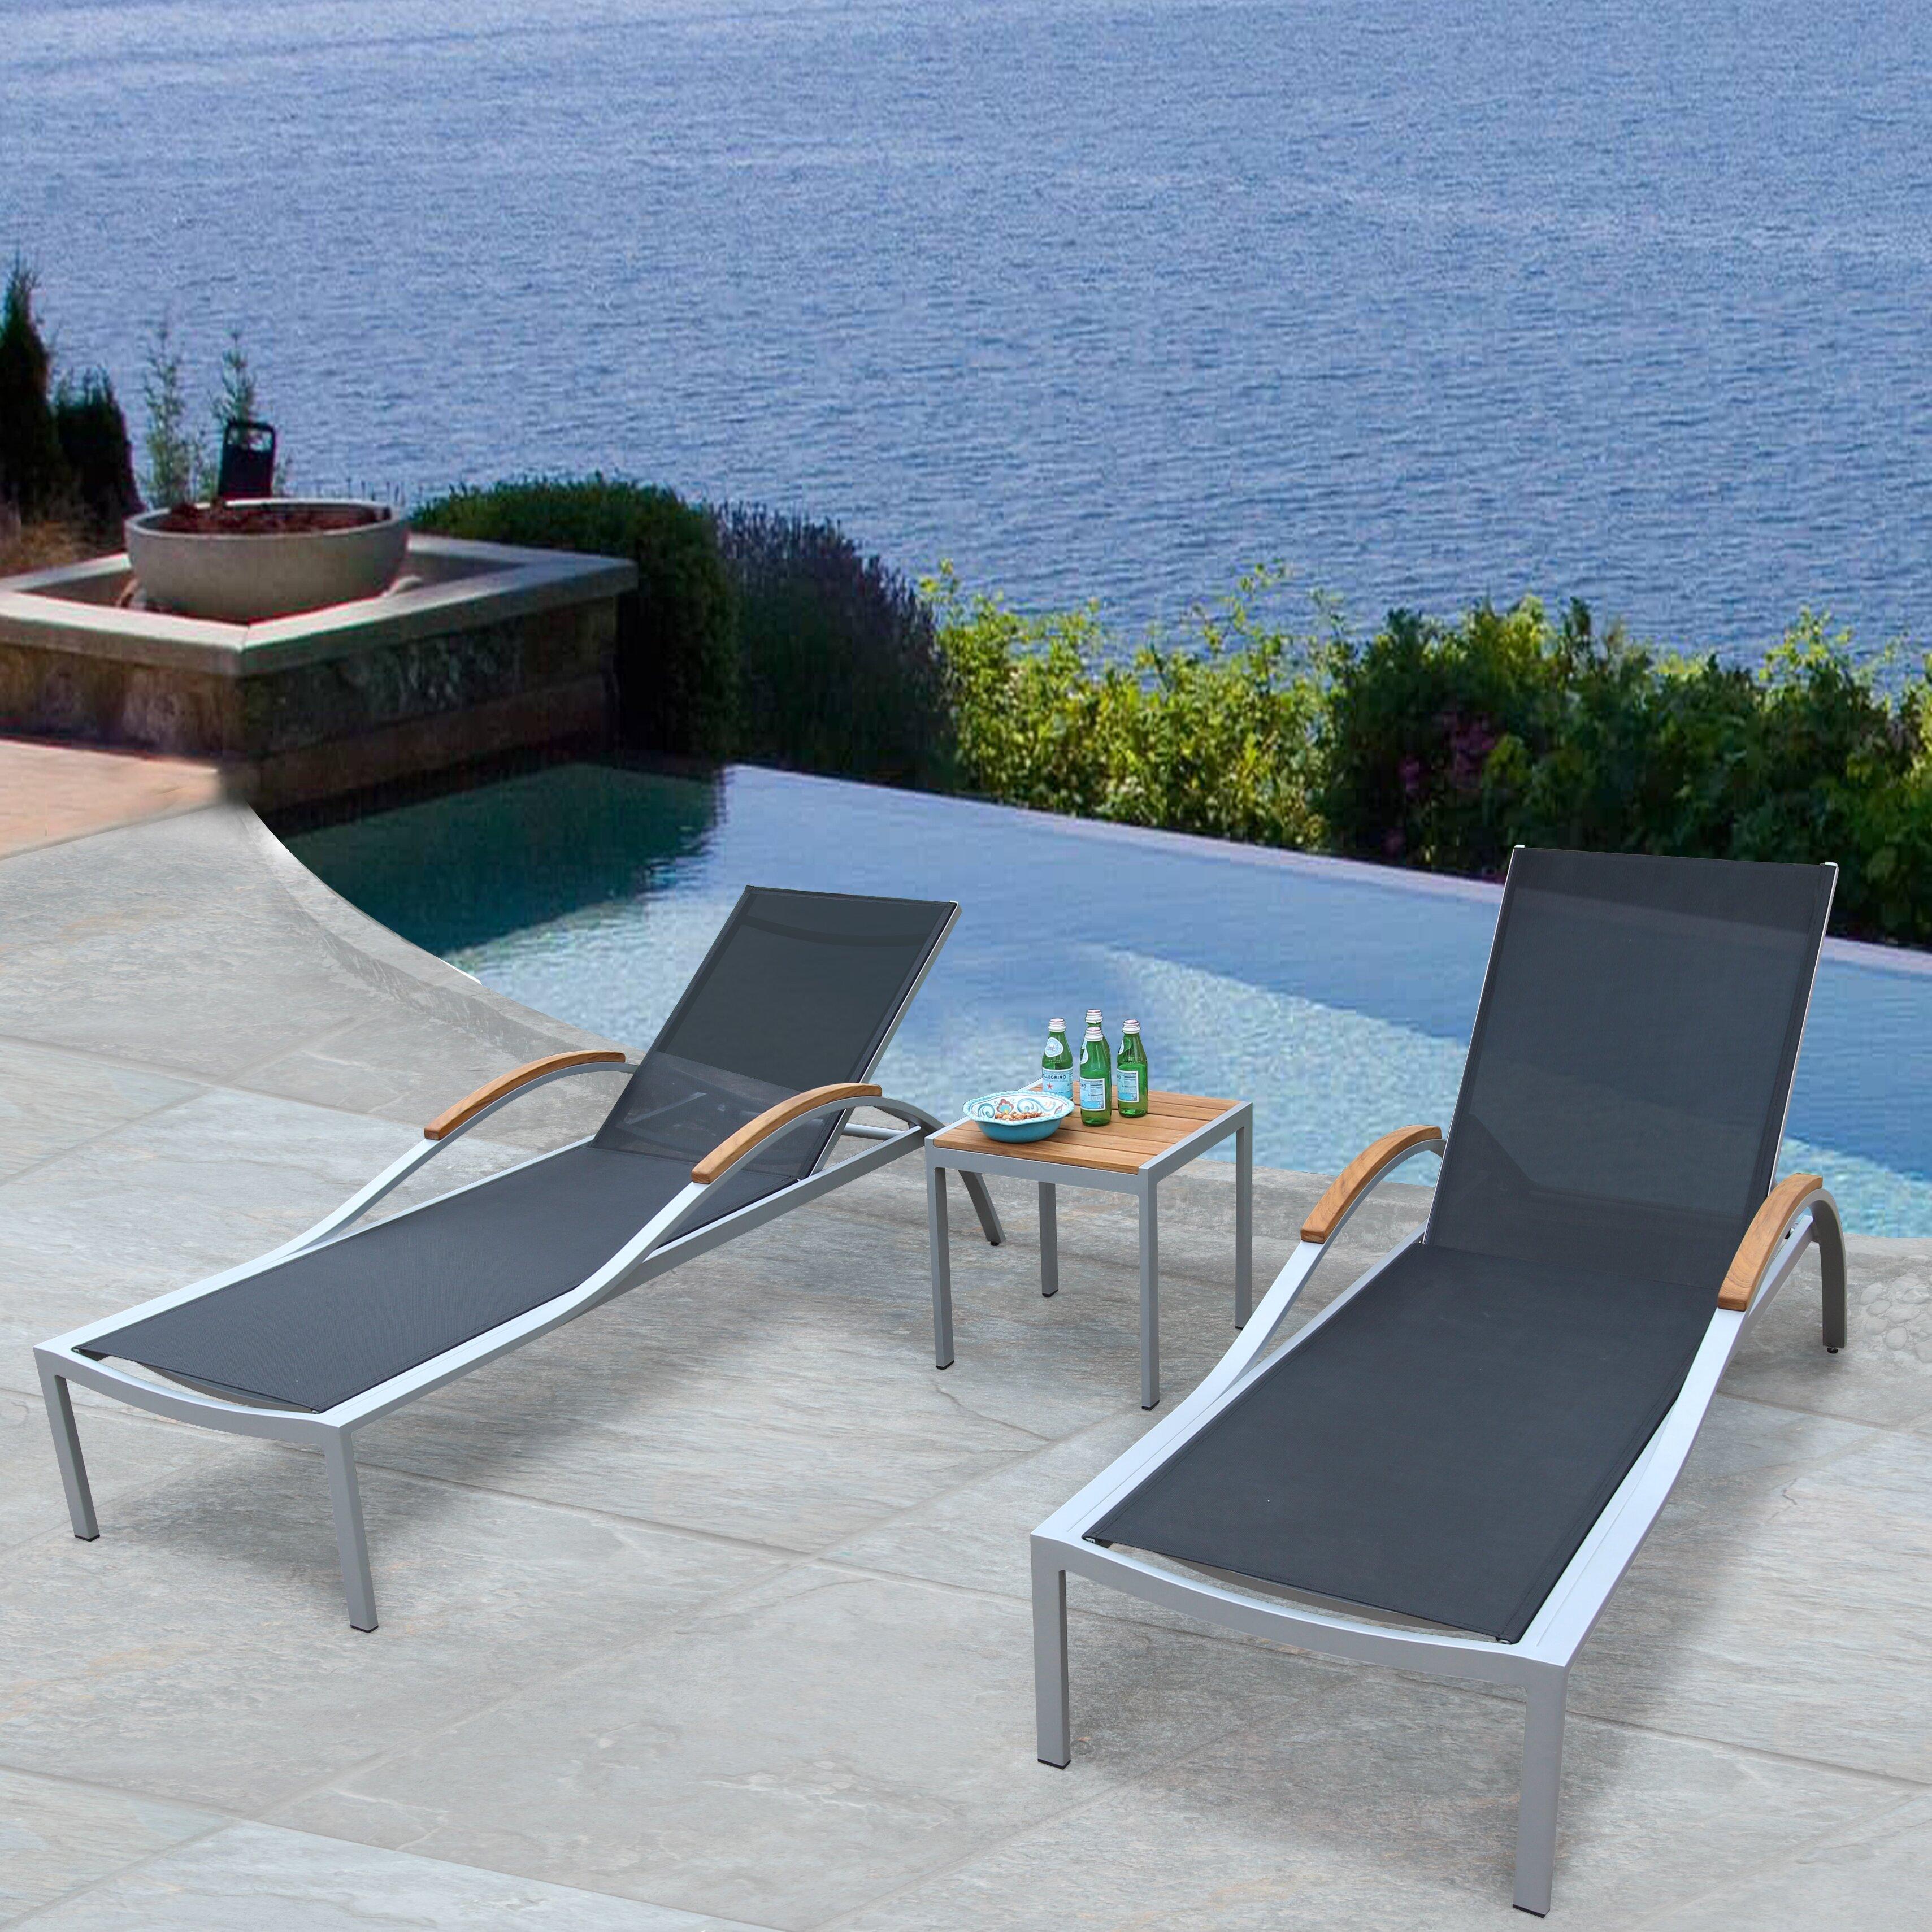 Bellini Galliano Reclining Teak Chaise Lounge Set | Wayfair